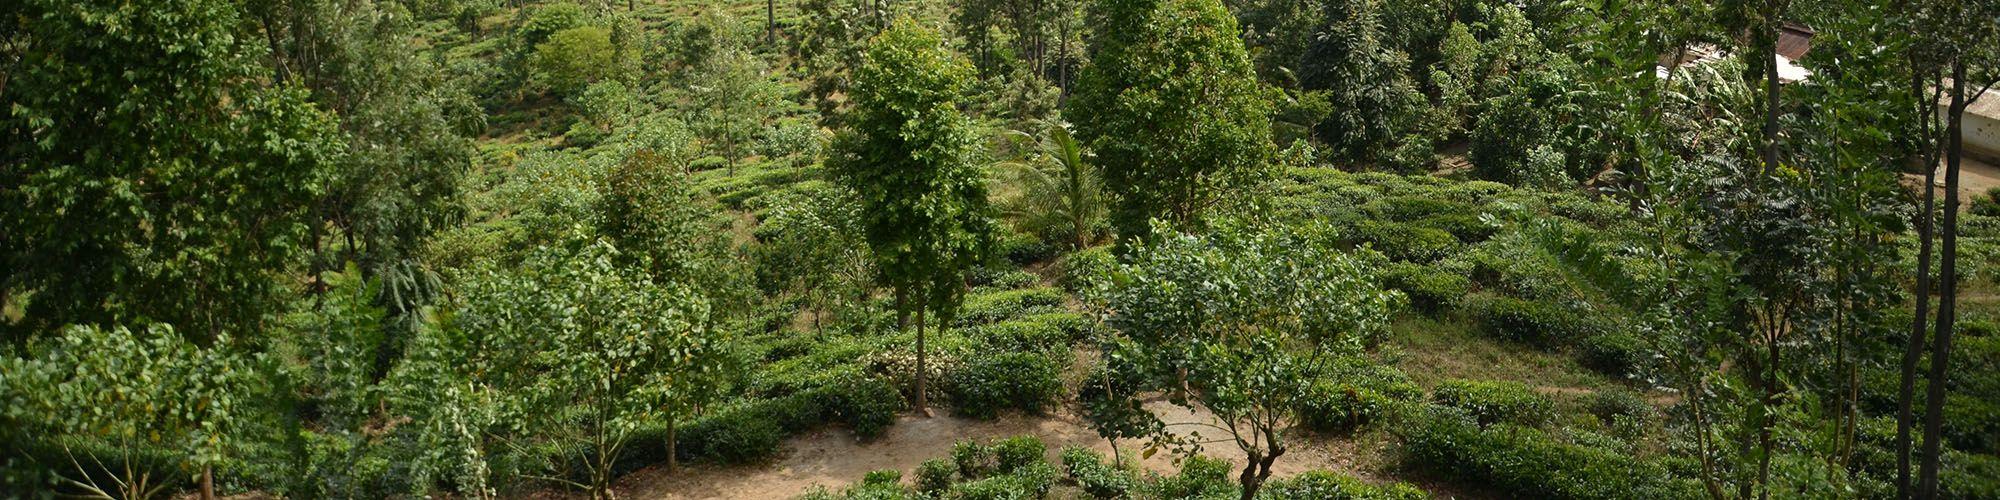 Sri Lanka, Hiking, Guide, Forests